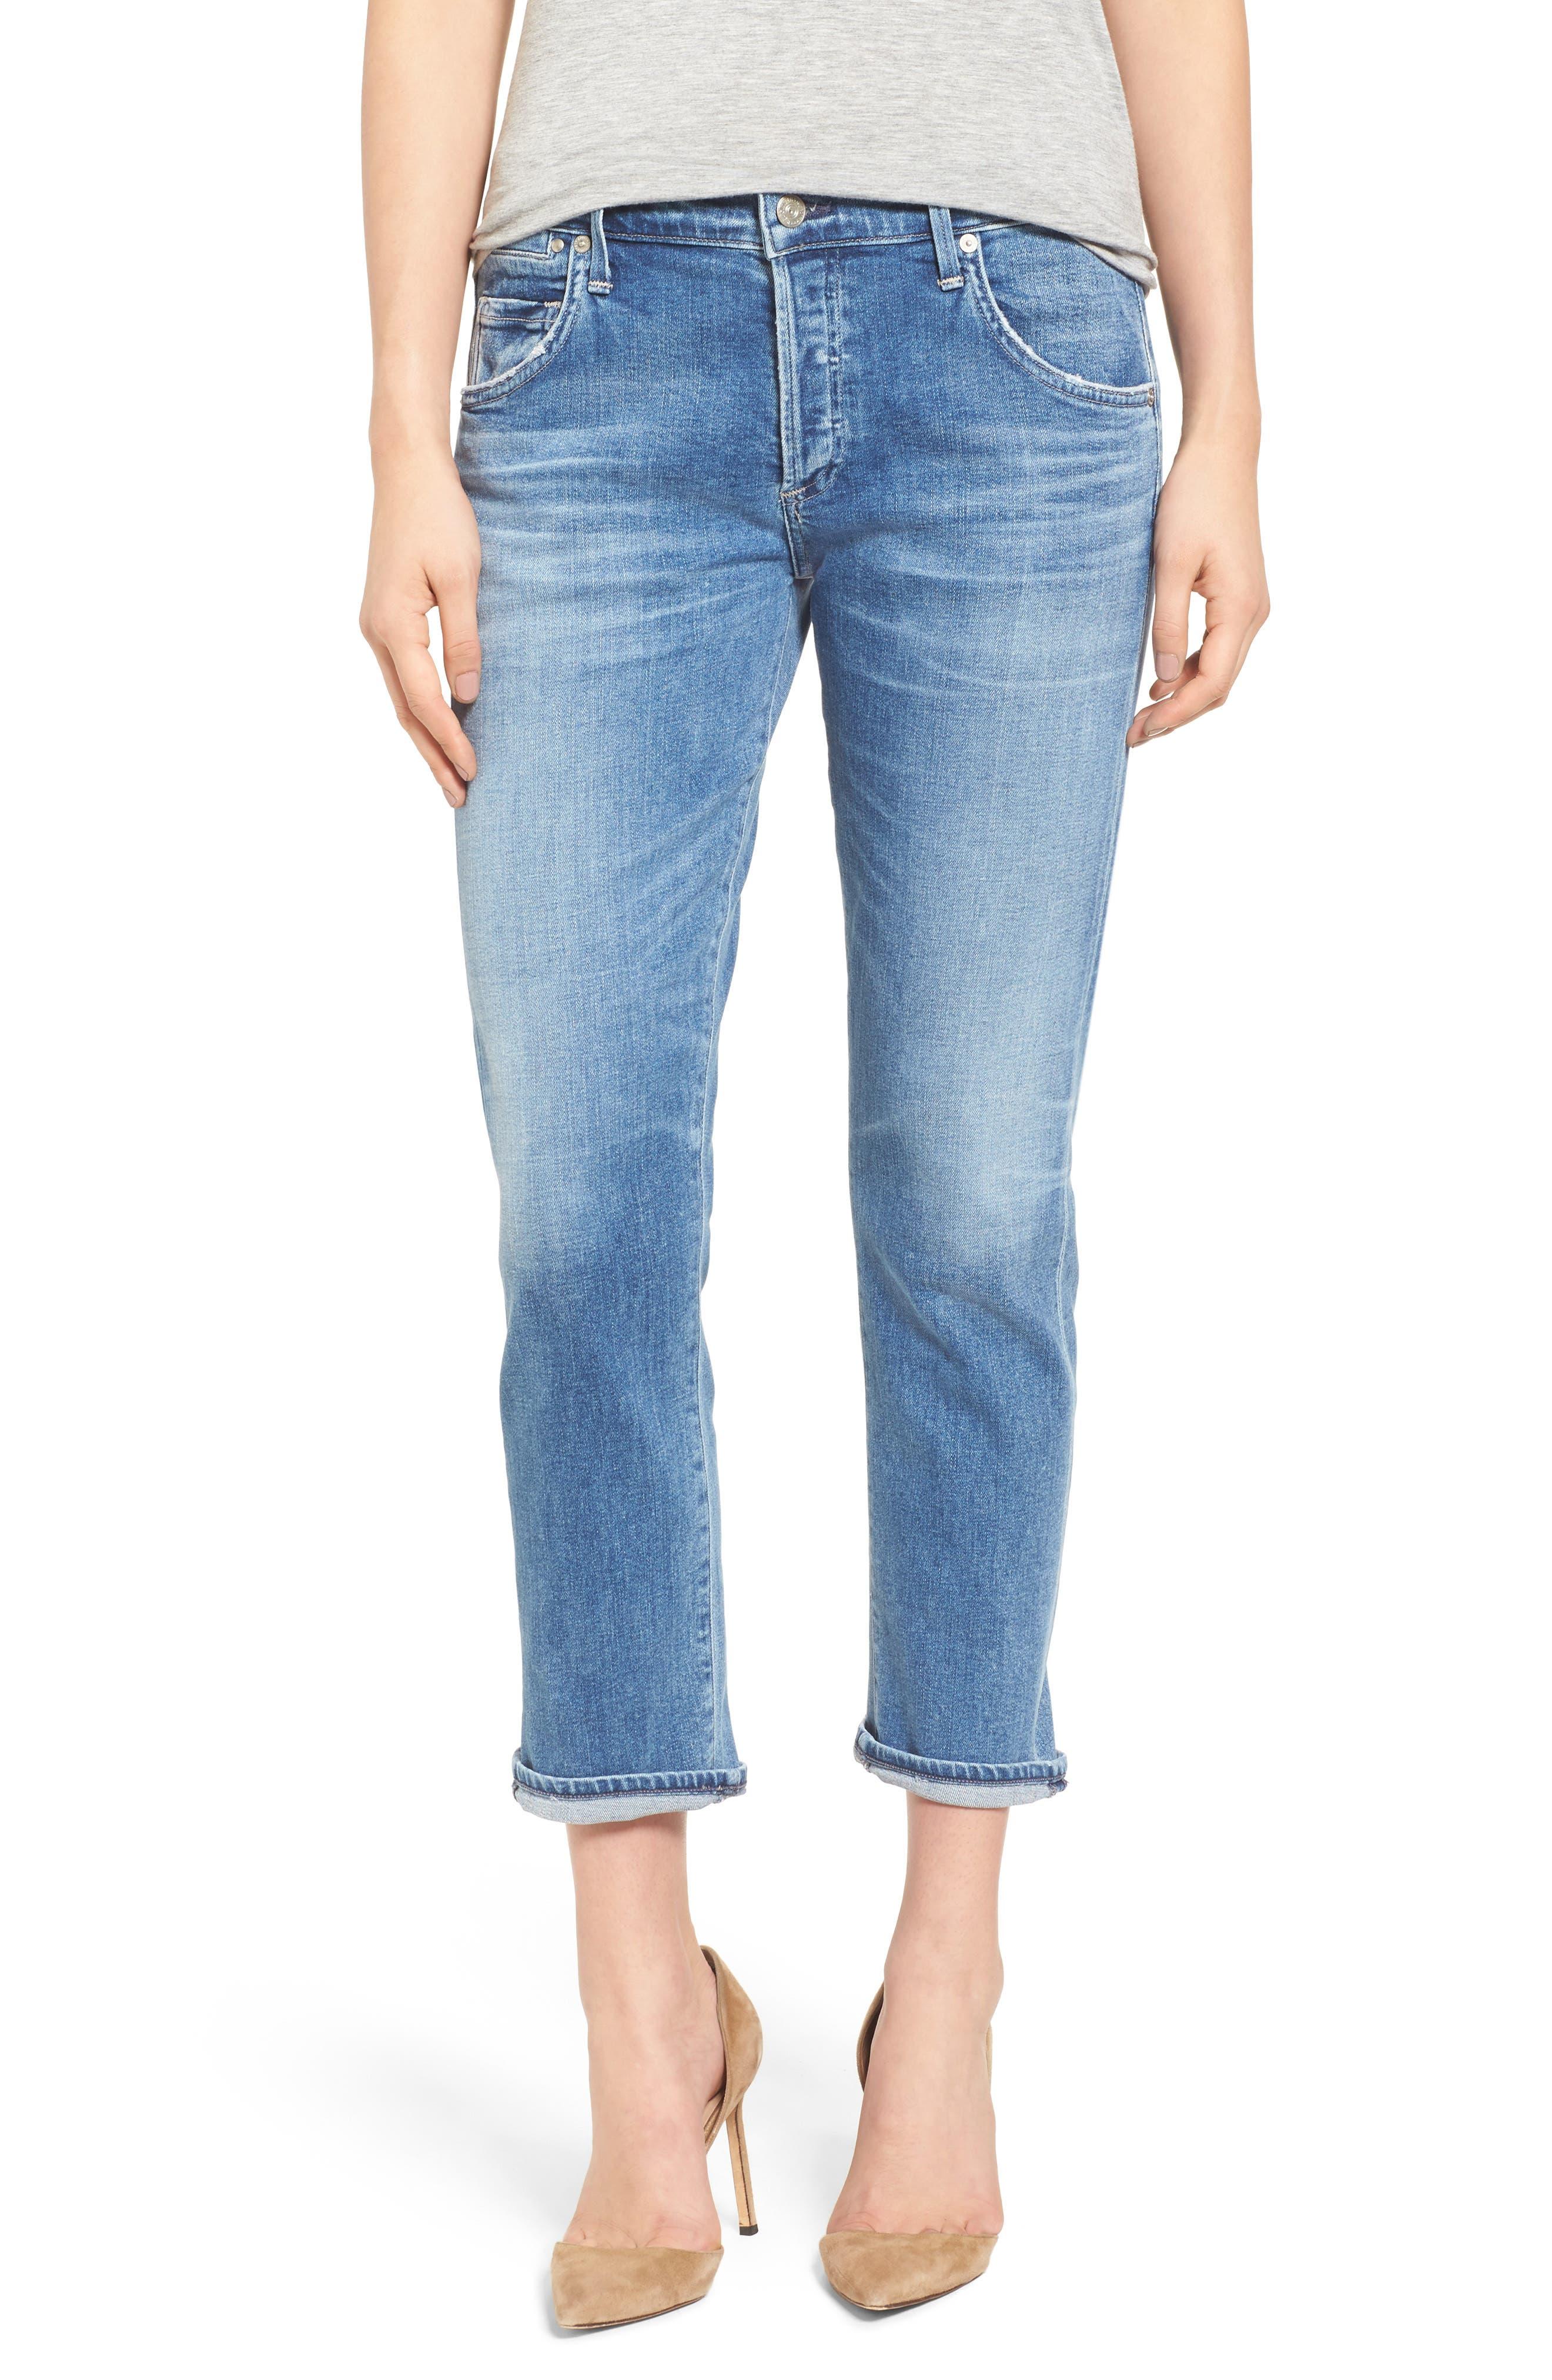 Citizens of Humanity Emerson Slim Boyfriend Jeans (Pacifica)